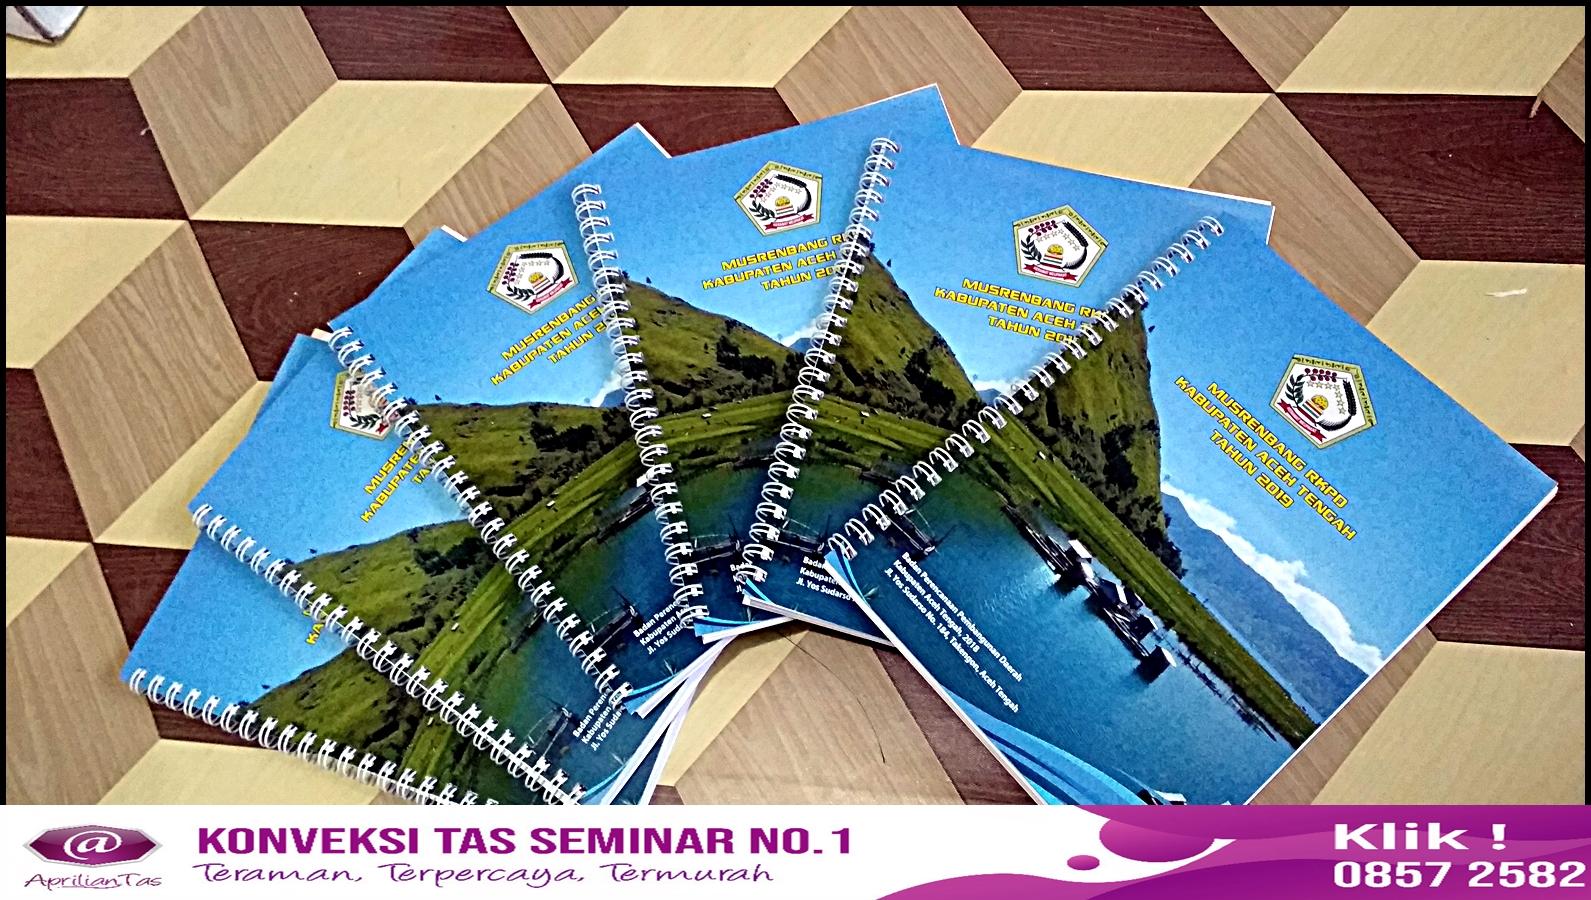 Tas Seminar Kit Bandung, Pesan Seminar Kit Murah Untuk Meriahkan Evenmu Tas untuk seminar,harga tas untuk seminar kit,model tas untuk seminar,harga tas untuk seminar, konveksi tas tangerang selatan,pengrajin tas di jakarta